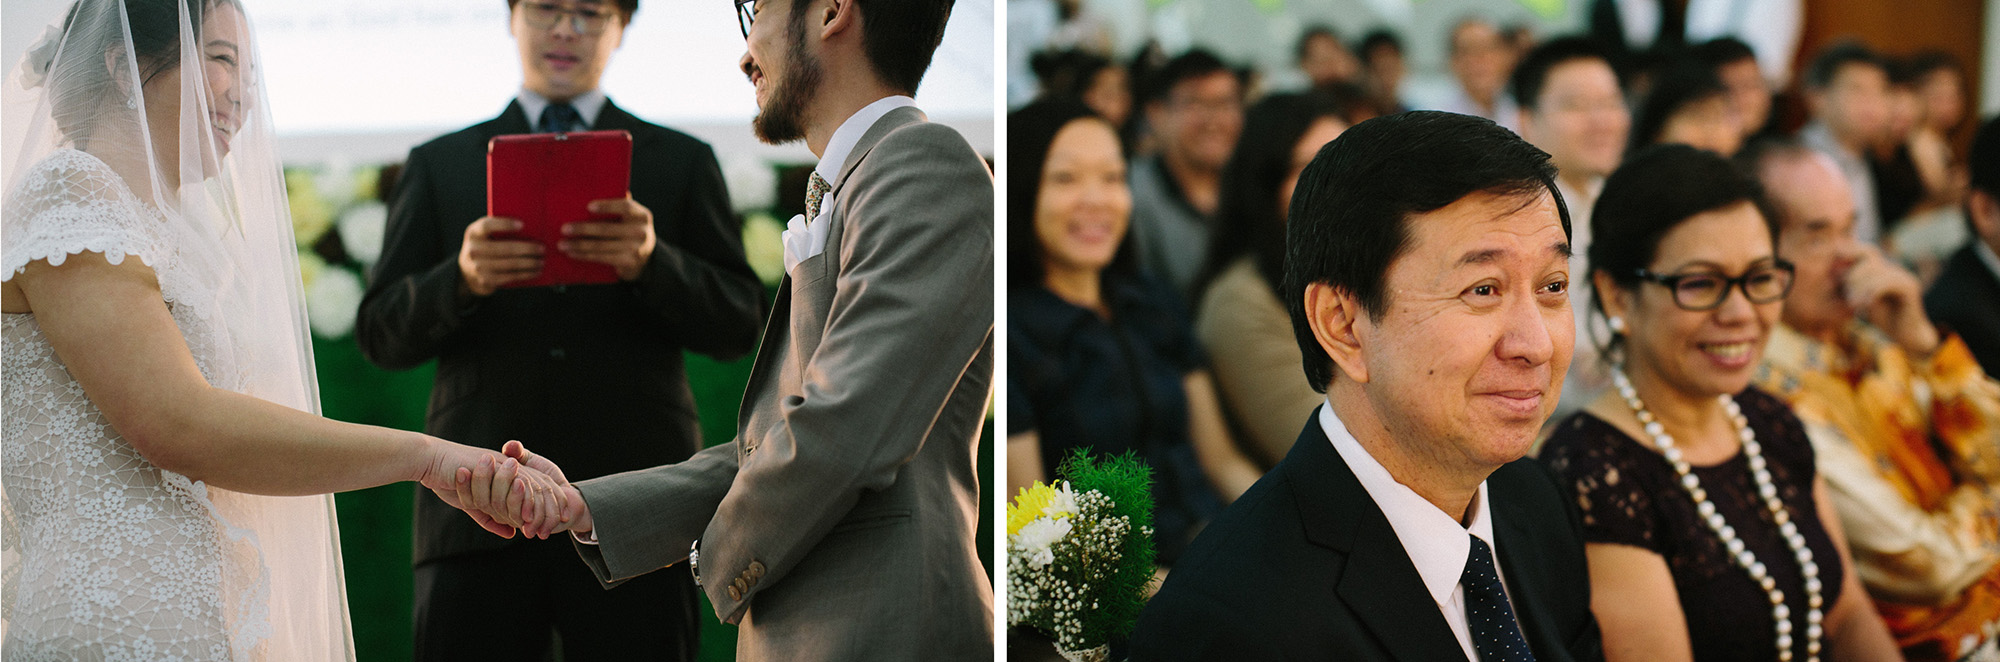 52-hellojanelee-sam grace-malaysia-wedding-day